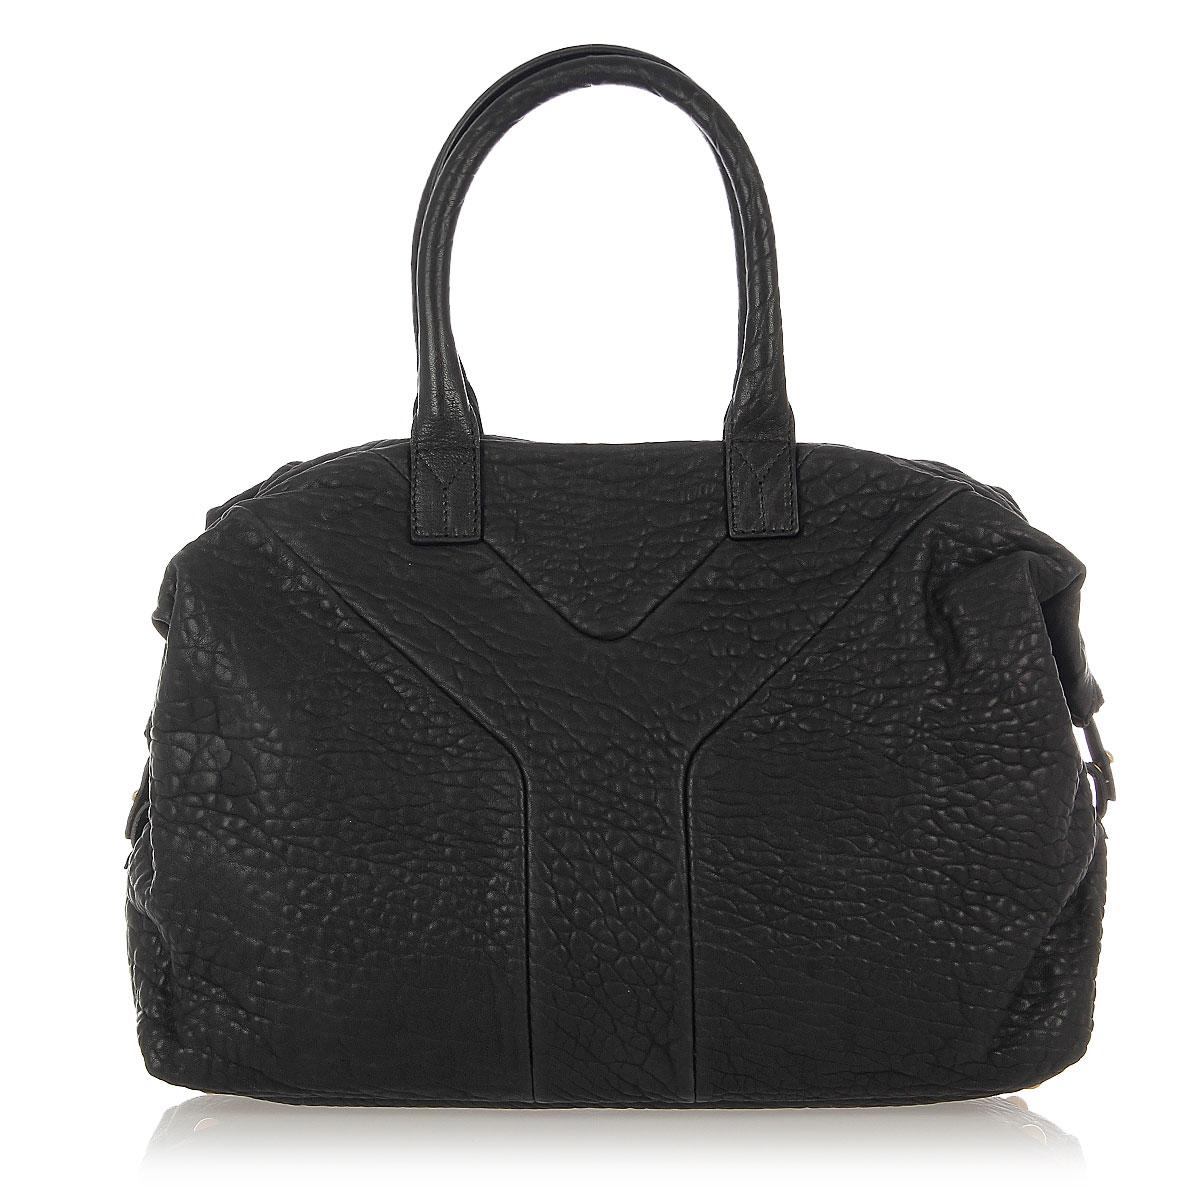 yves saint laurent leather sac easy bag